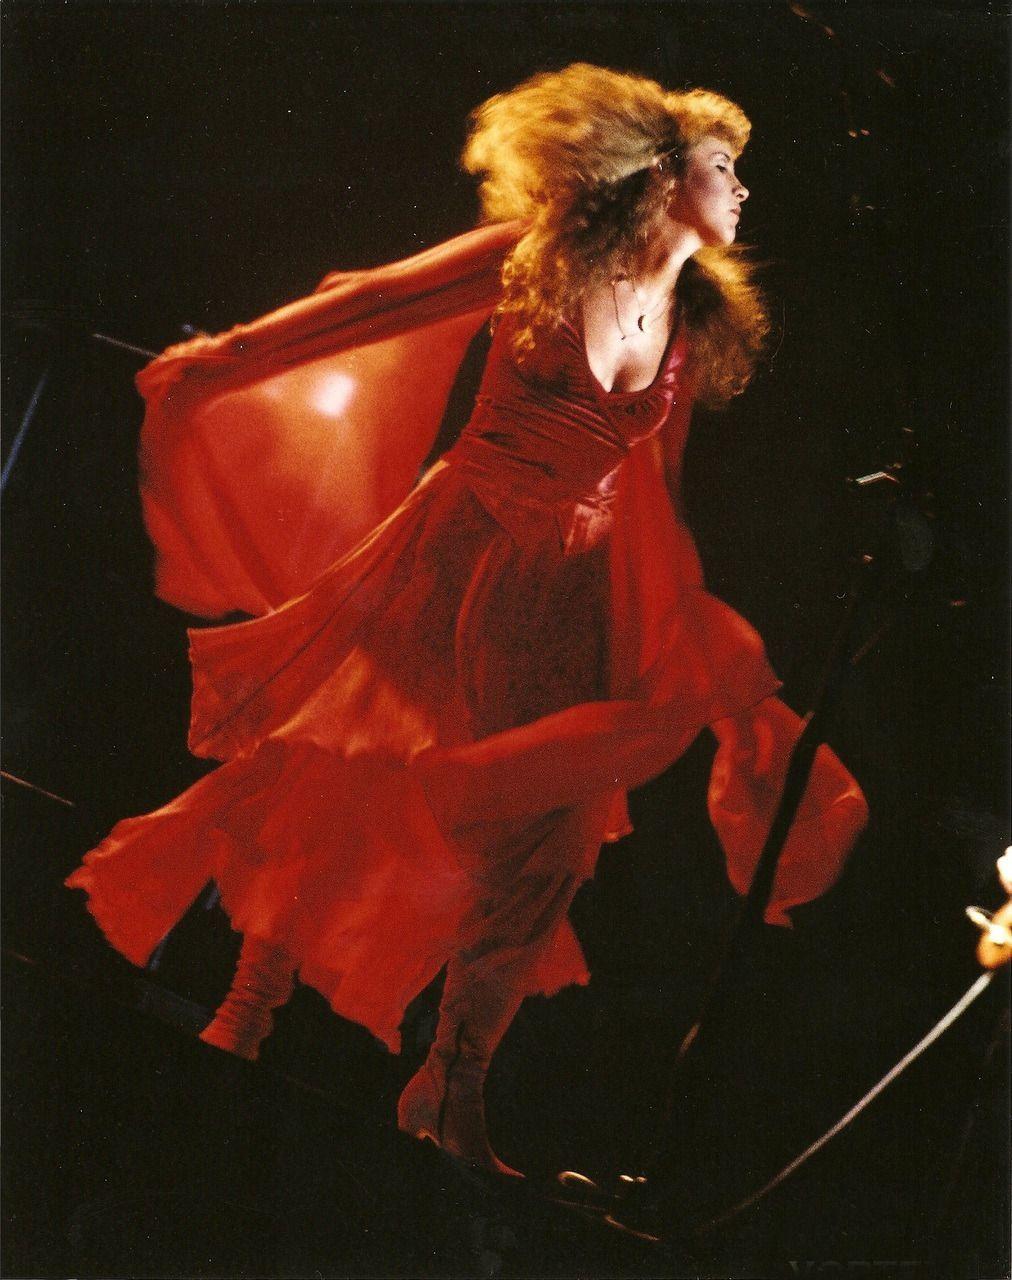 Twirling Stevie Nicks Stevie Nicks Fleetwood Mac Fleetwood Mac [ 1280 x 1012 Pixel ]